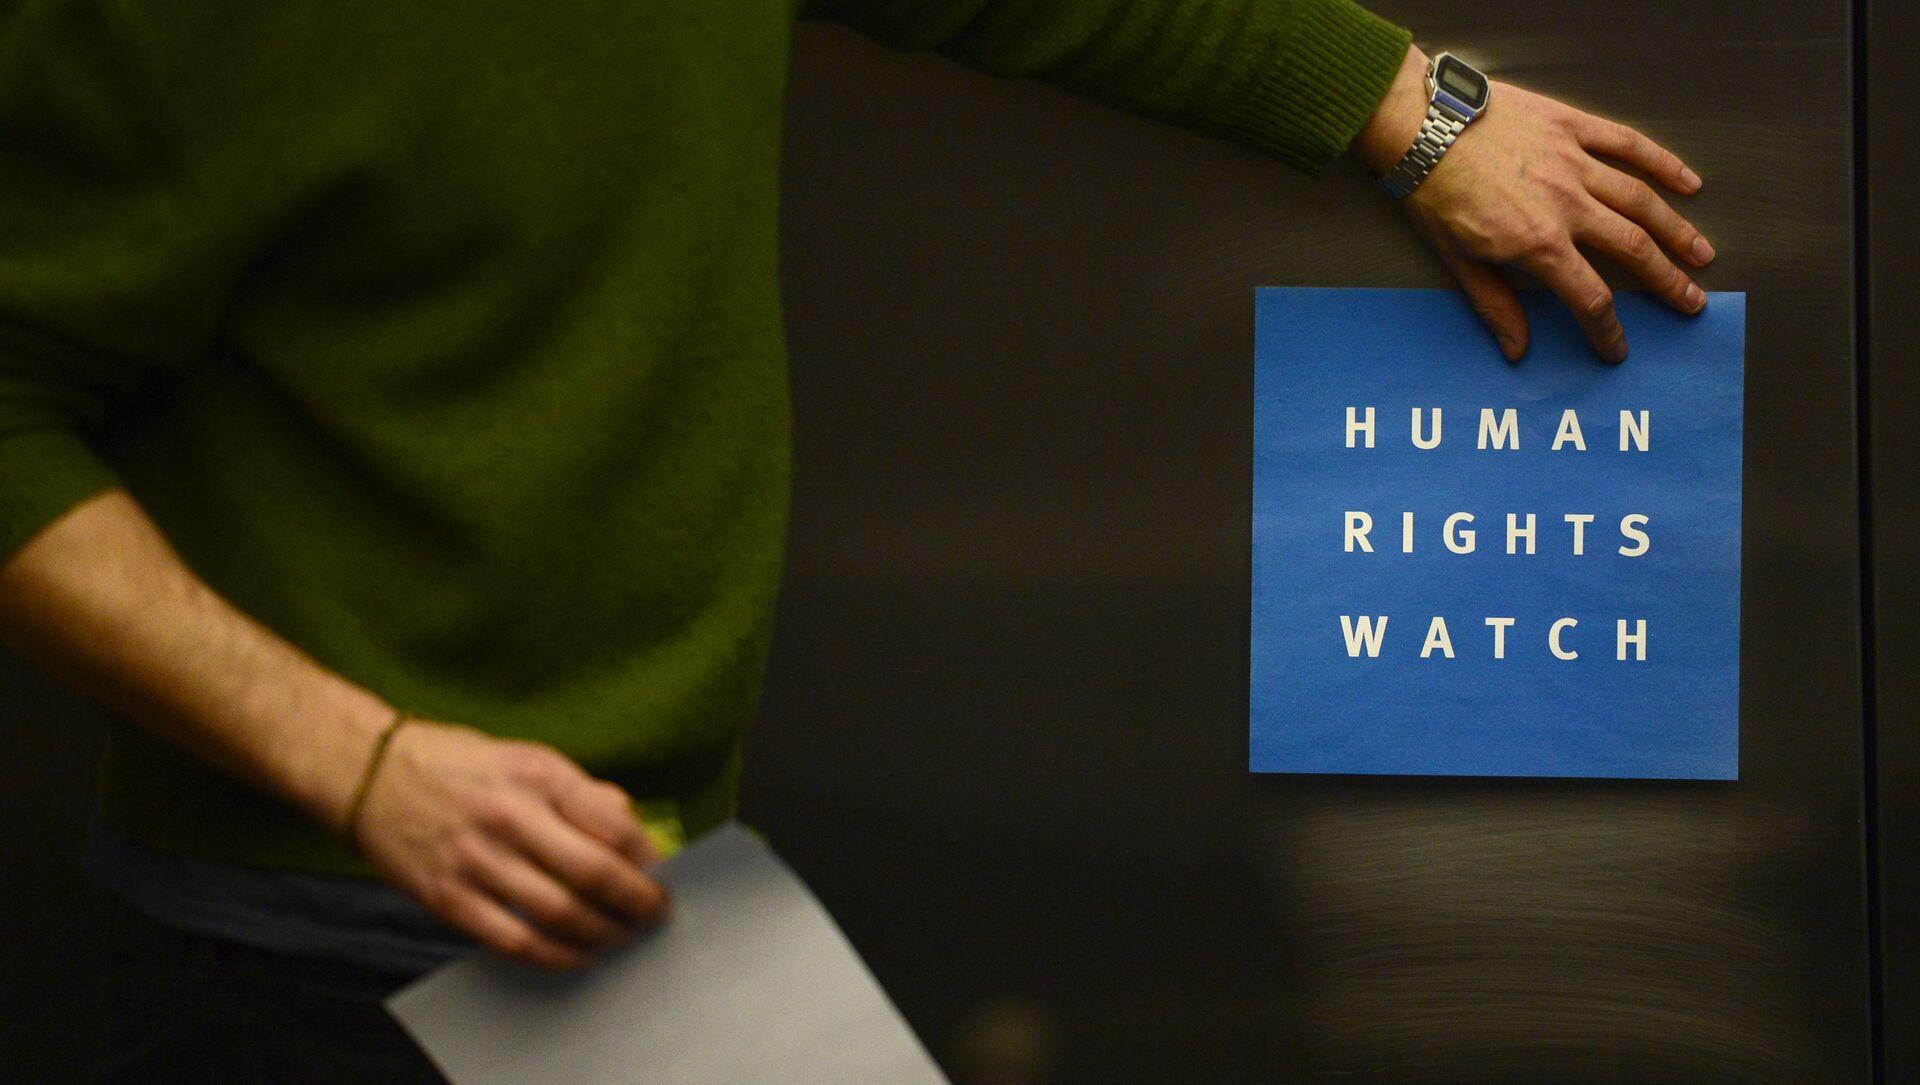 Logo de Human Rights Watch - Sputnik Mundo, 1920, 10.02.2021